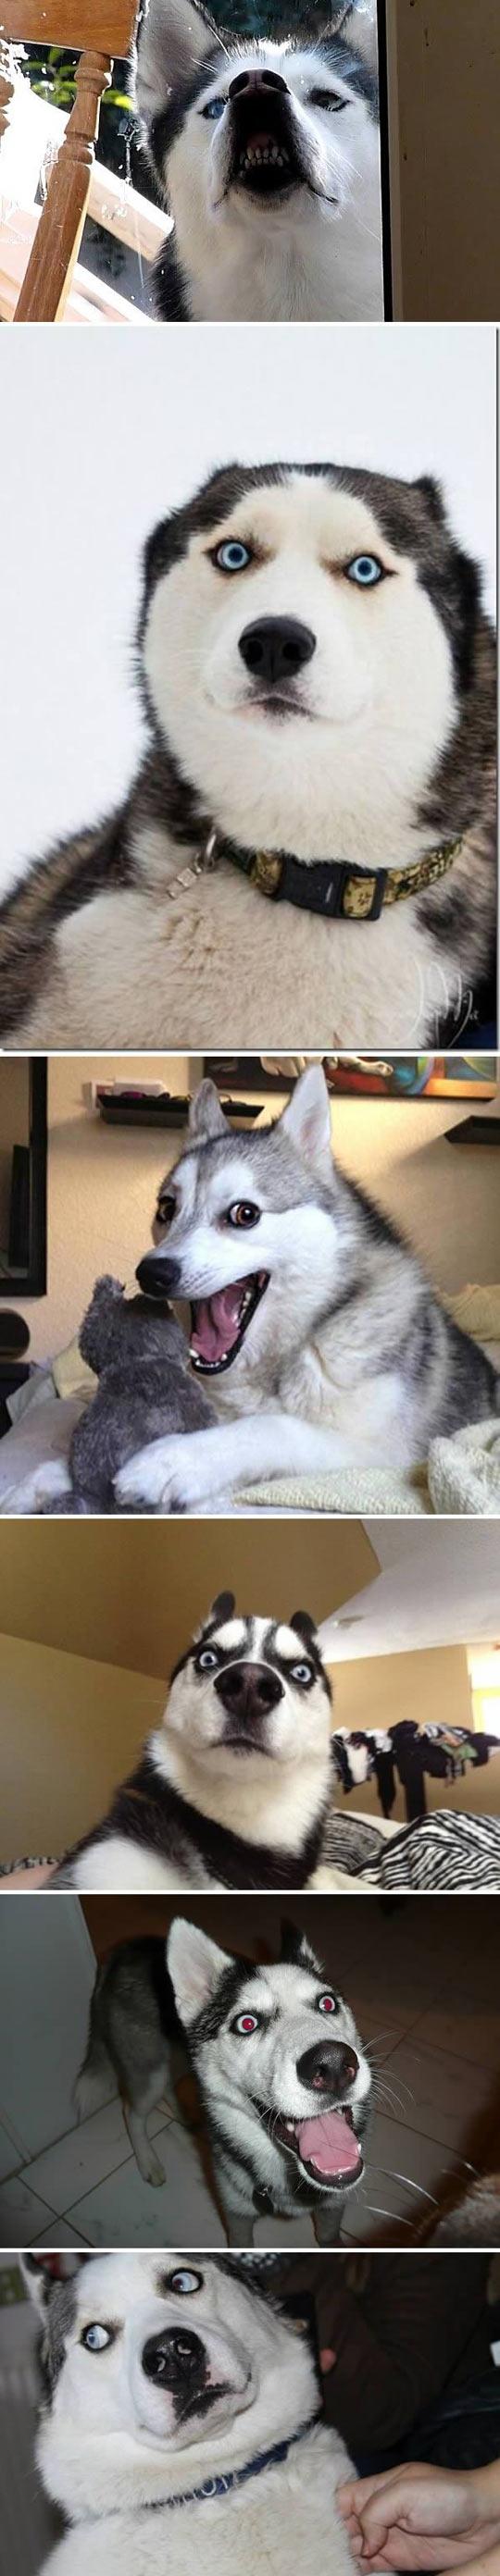 funny-husky-dog-Siberian-faces-smile